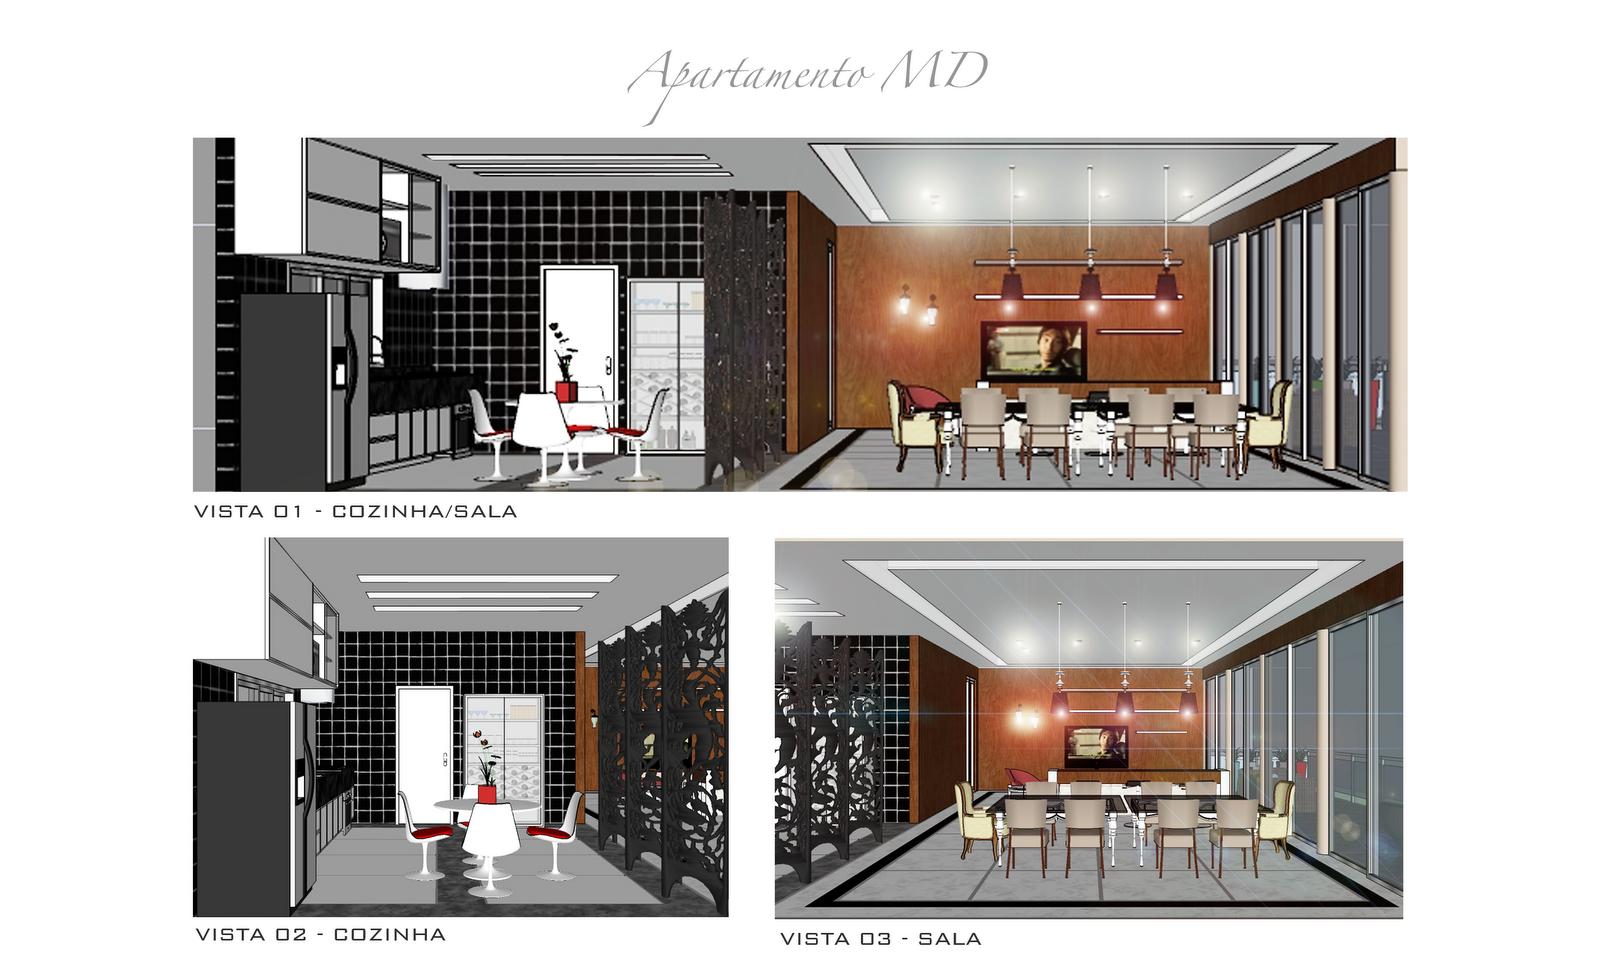 Magalhães Design de Ideias: INTERIOR DESIGN / DESIGN DE INTERIORES #7D482D 1600 960